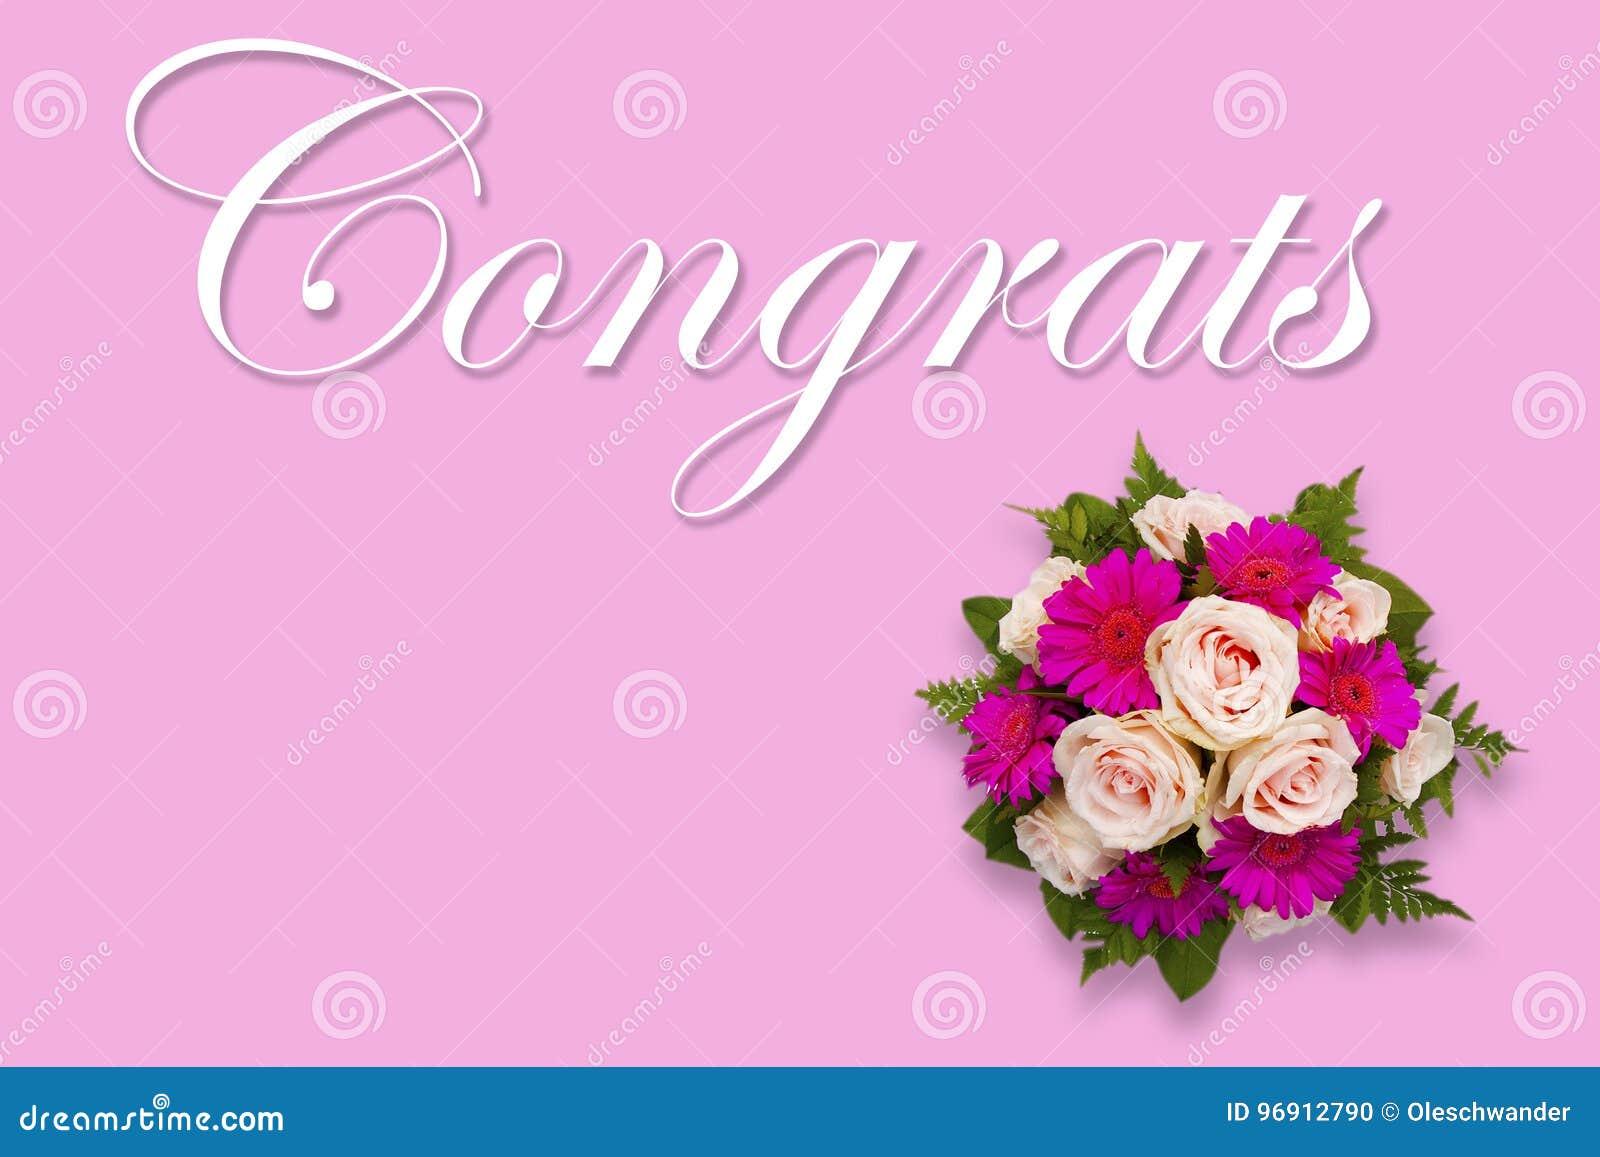 Romantic Floral Congrats Card With Flower Bouquet Stock Illustration